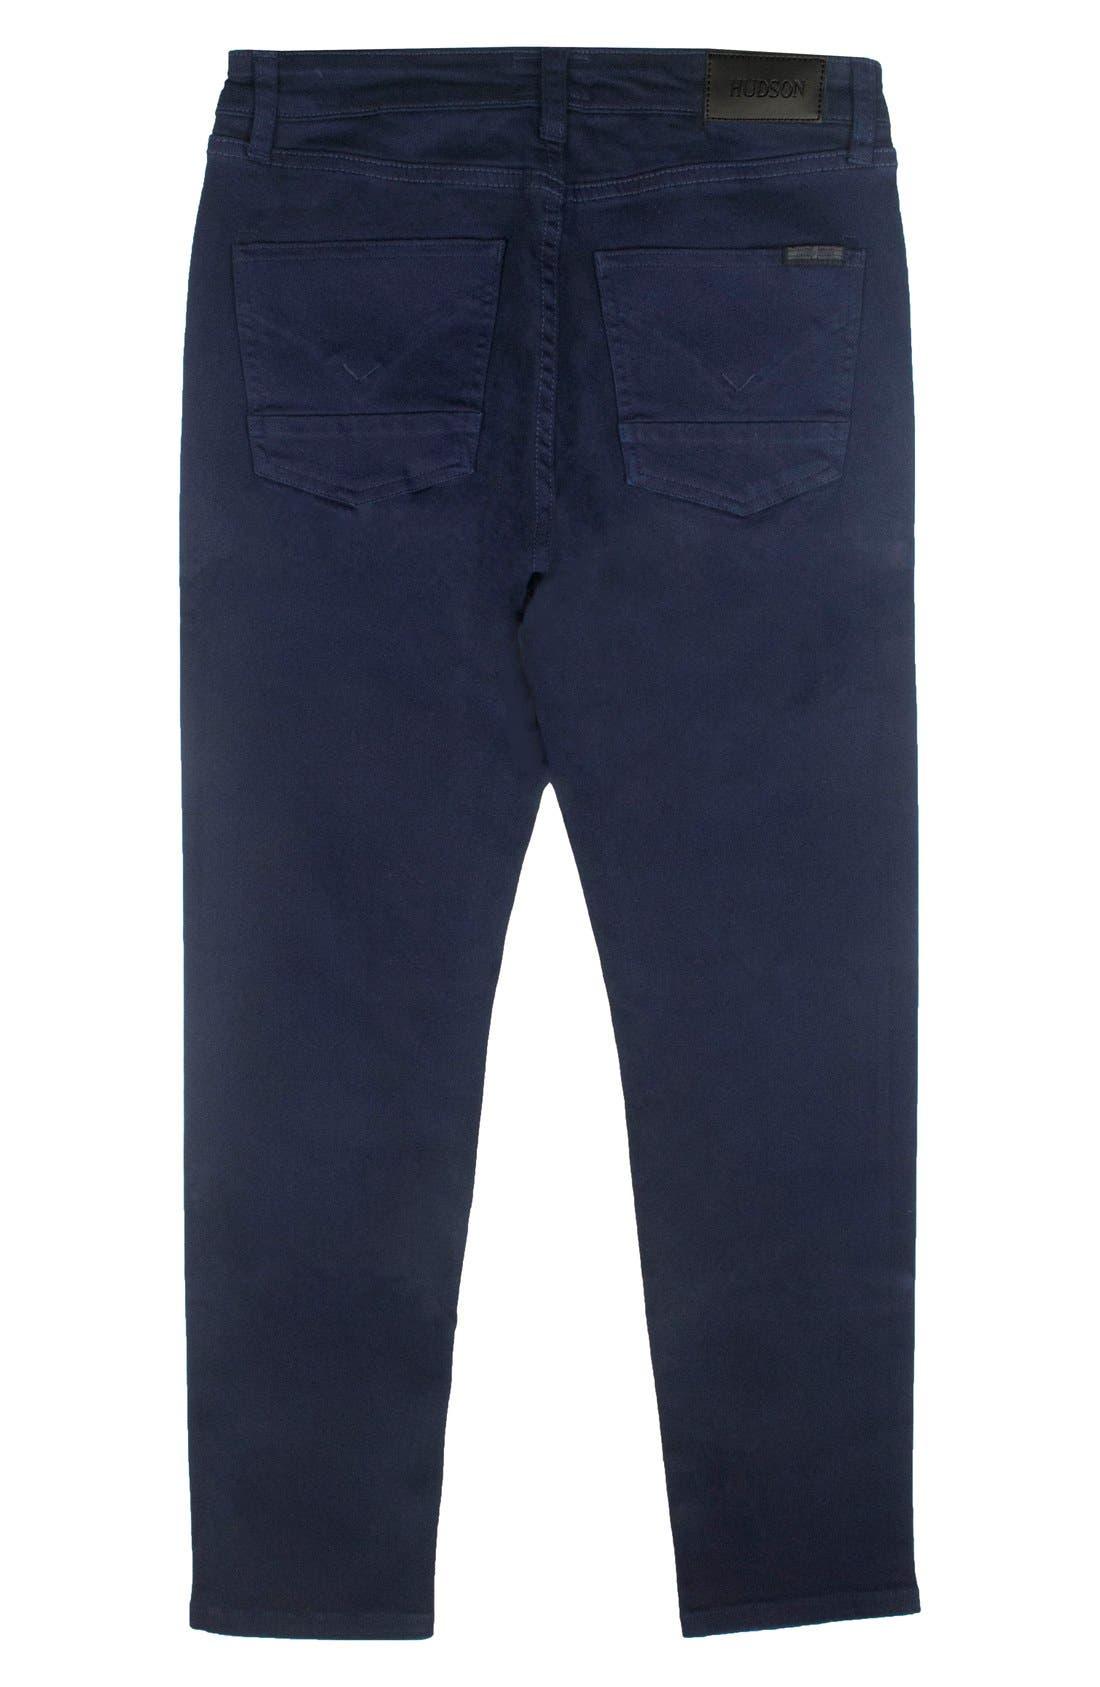 Jagger Slim Fit Straight Leg Jeans,                             Alternate thumbnail 9, color,